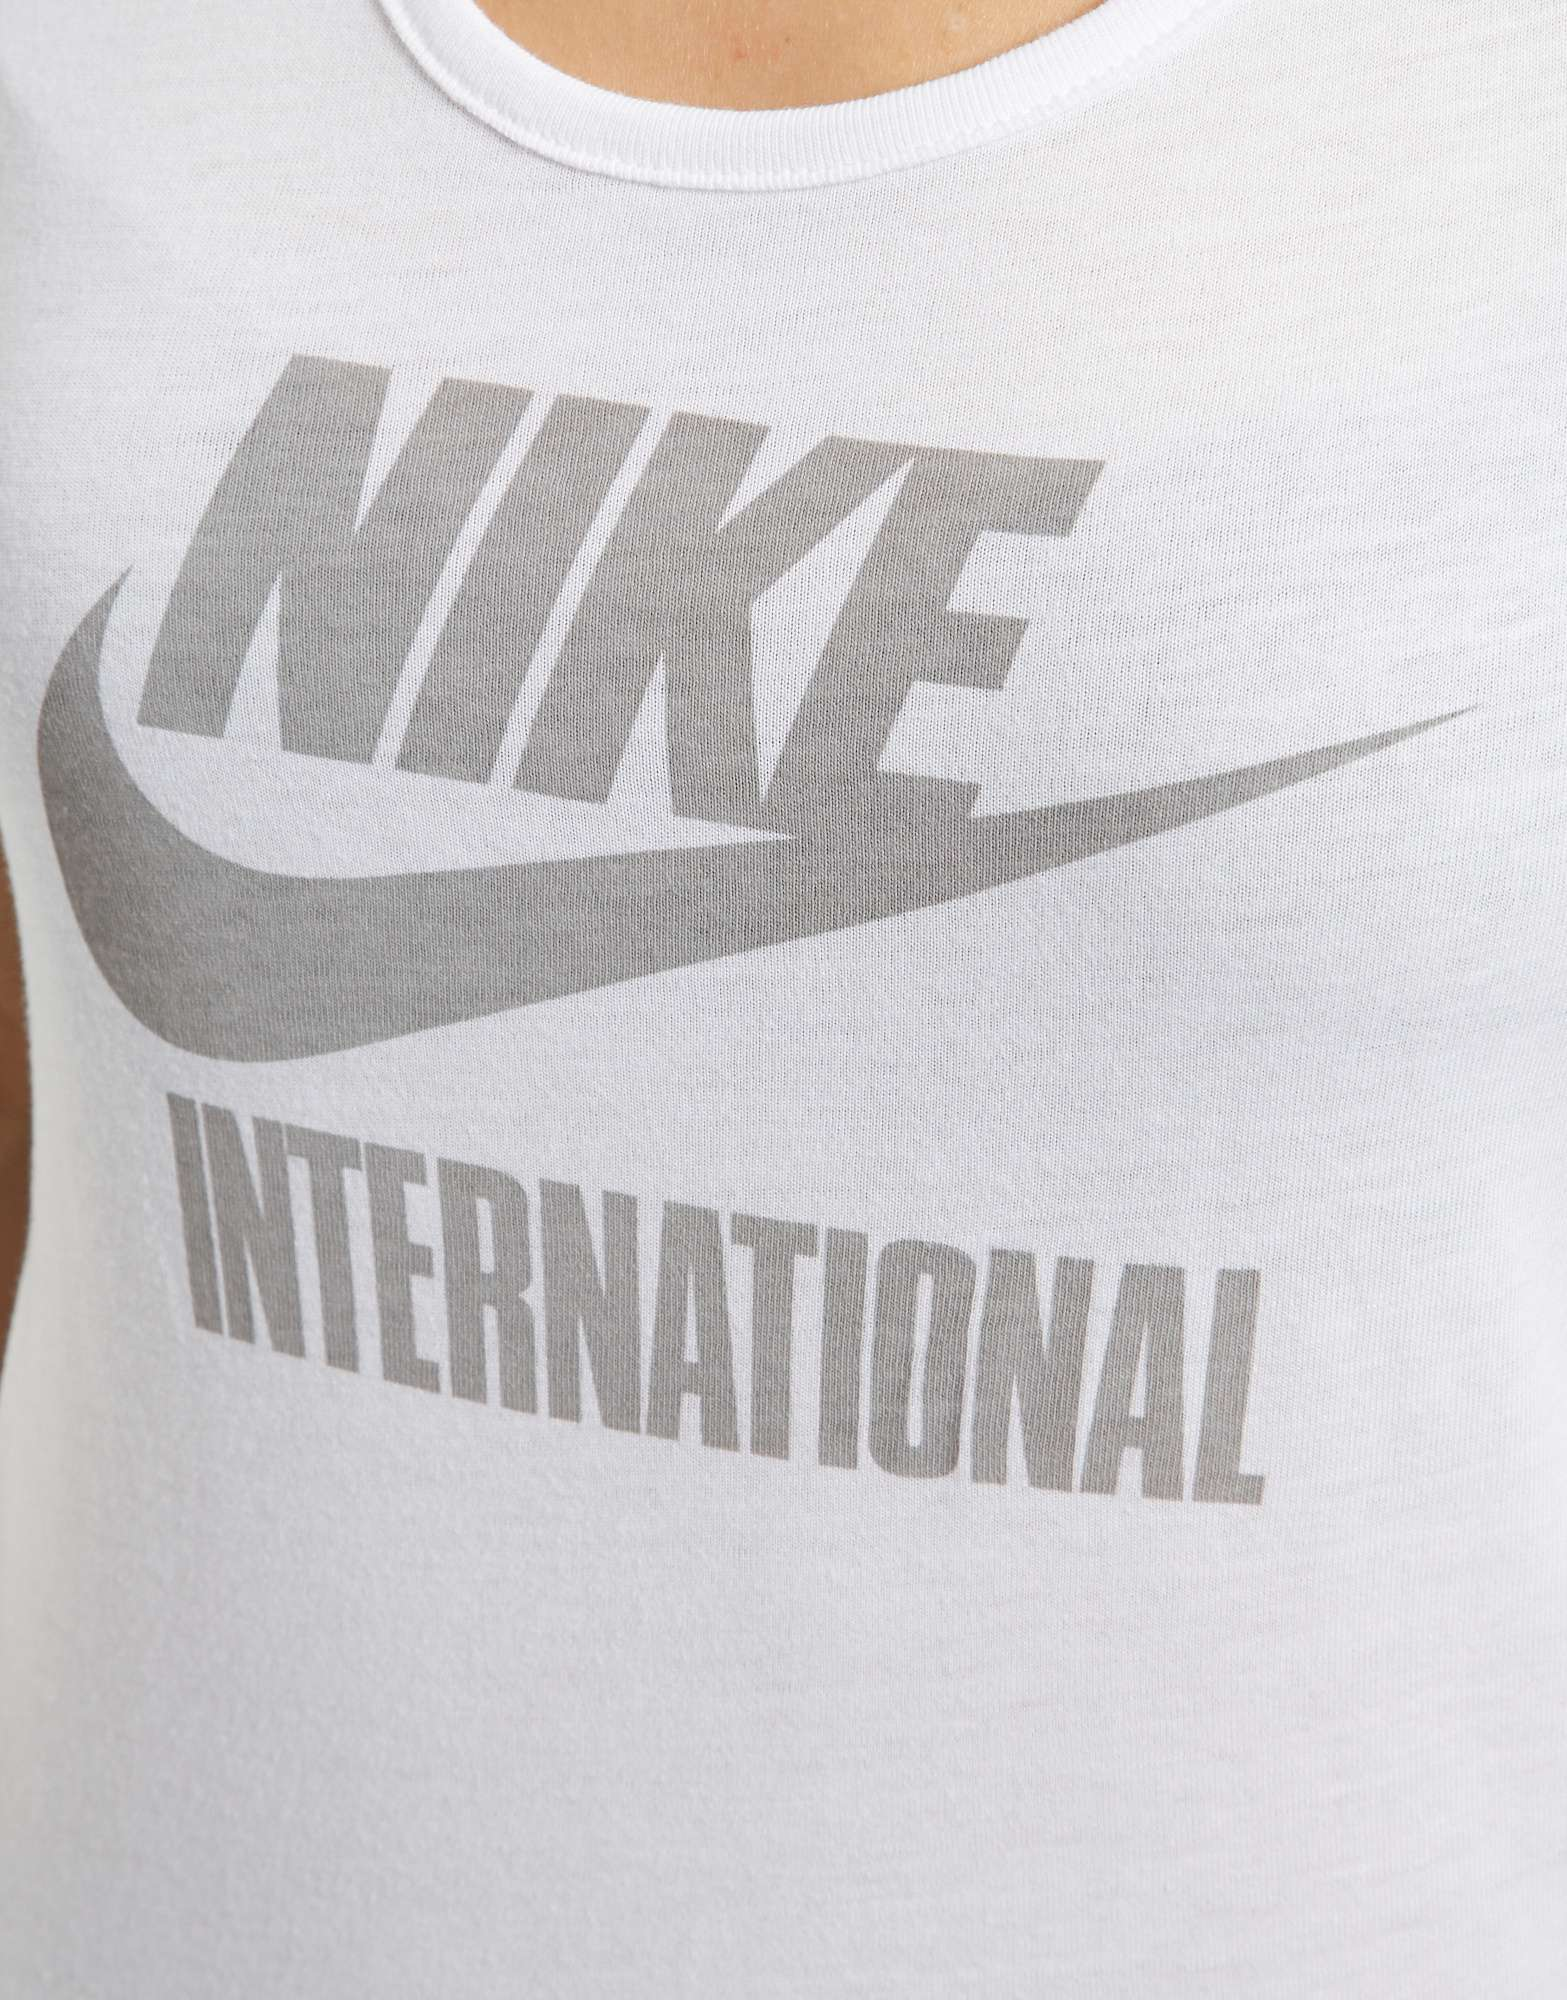 Nike International Air Print Tank Top